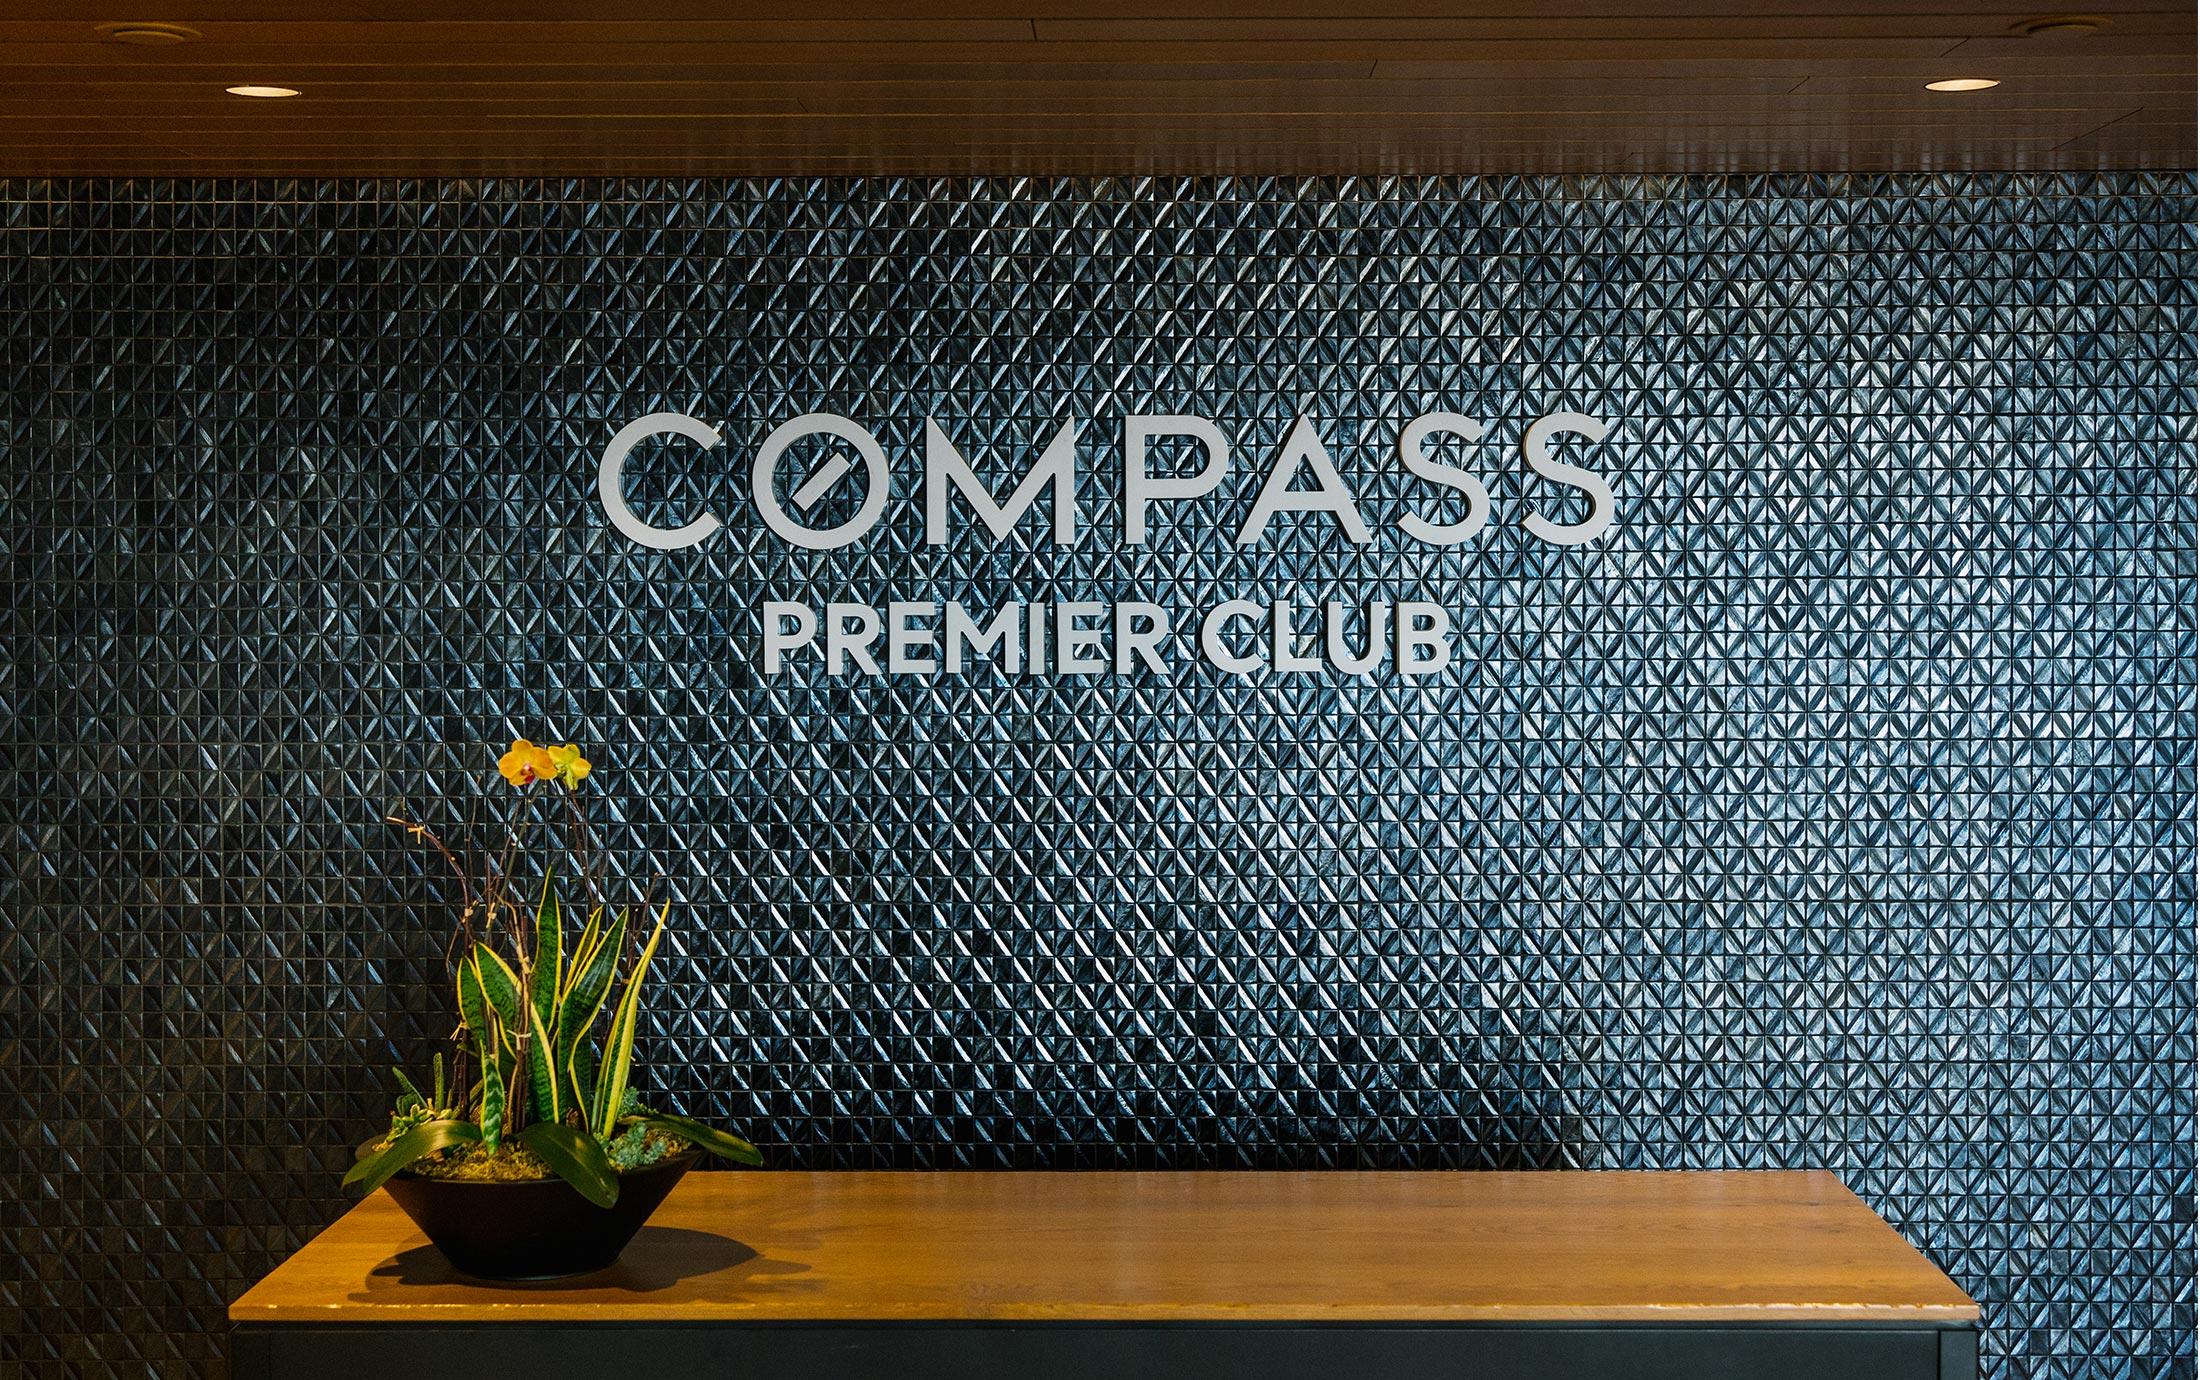 Compass Premier Club at Petco Park